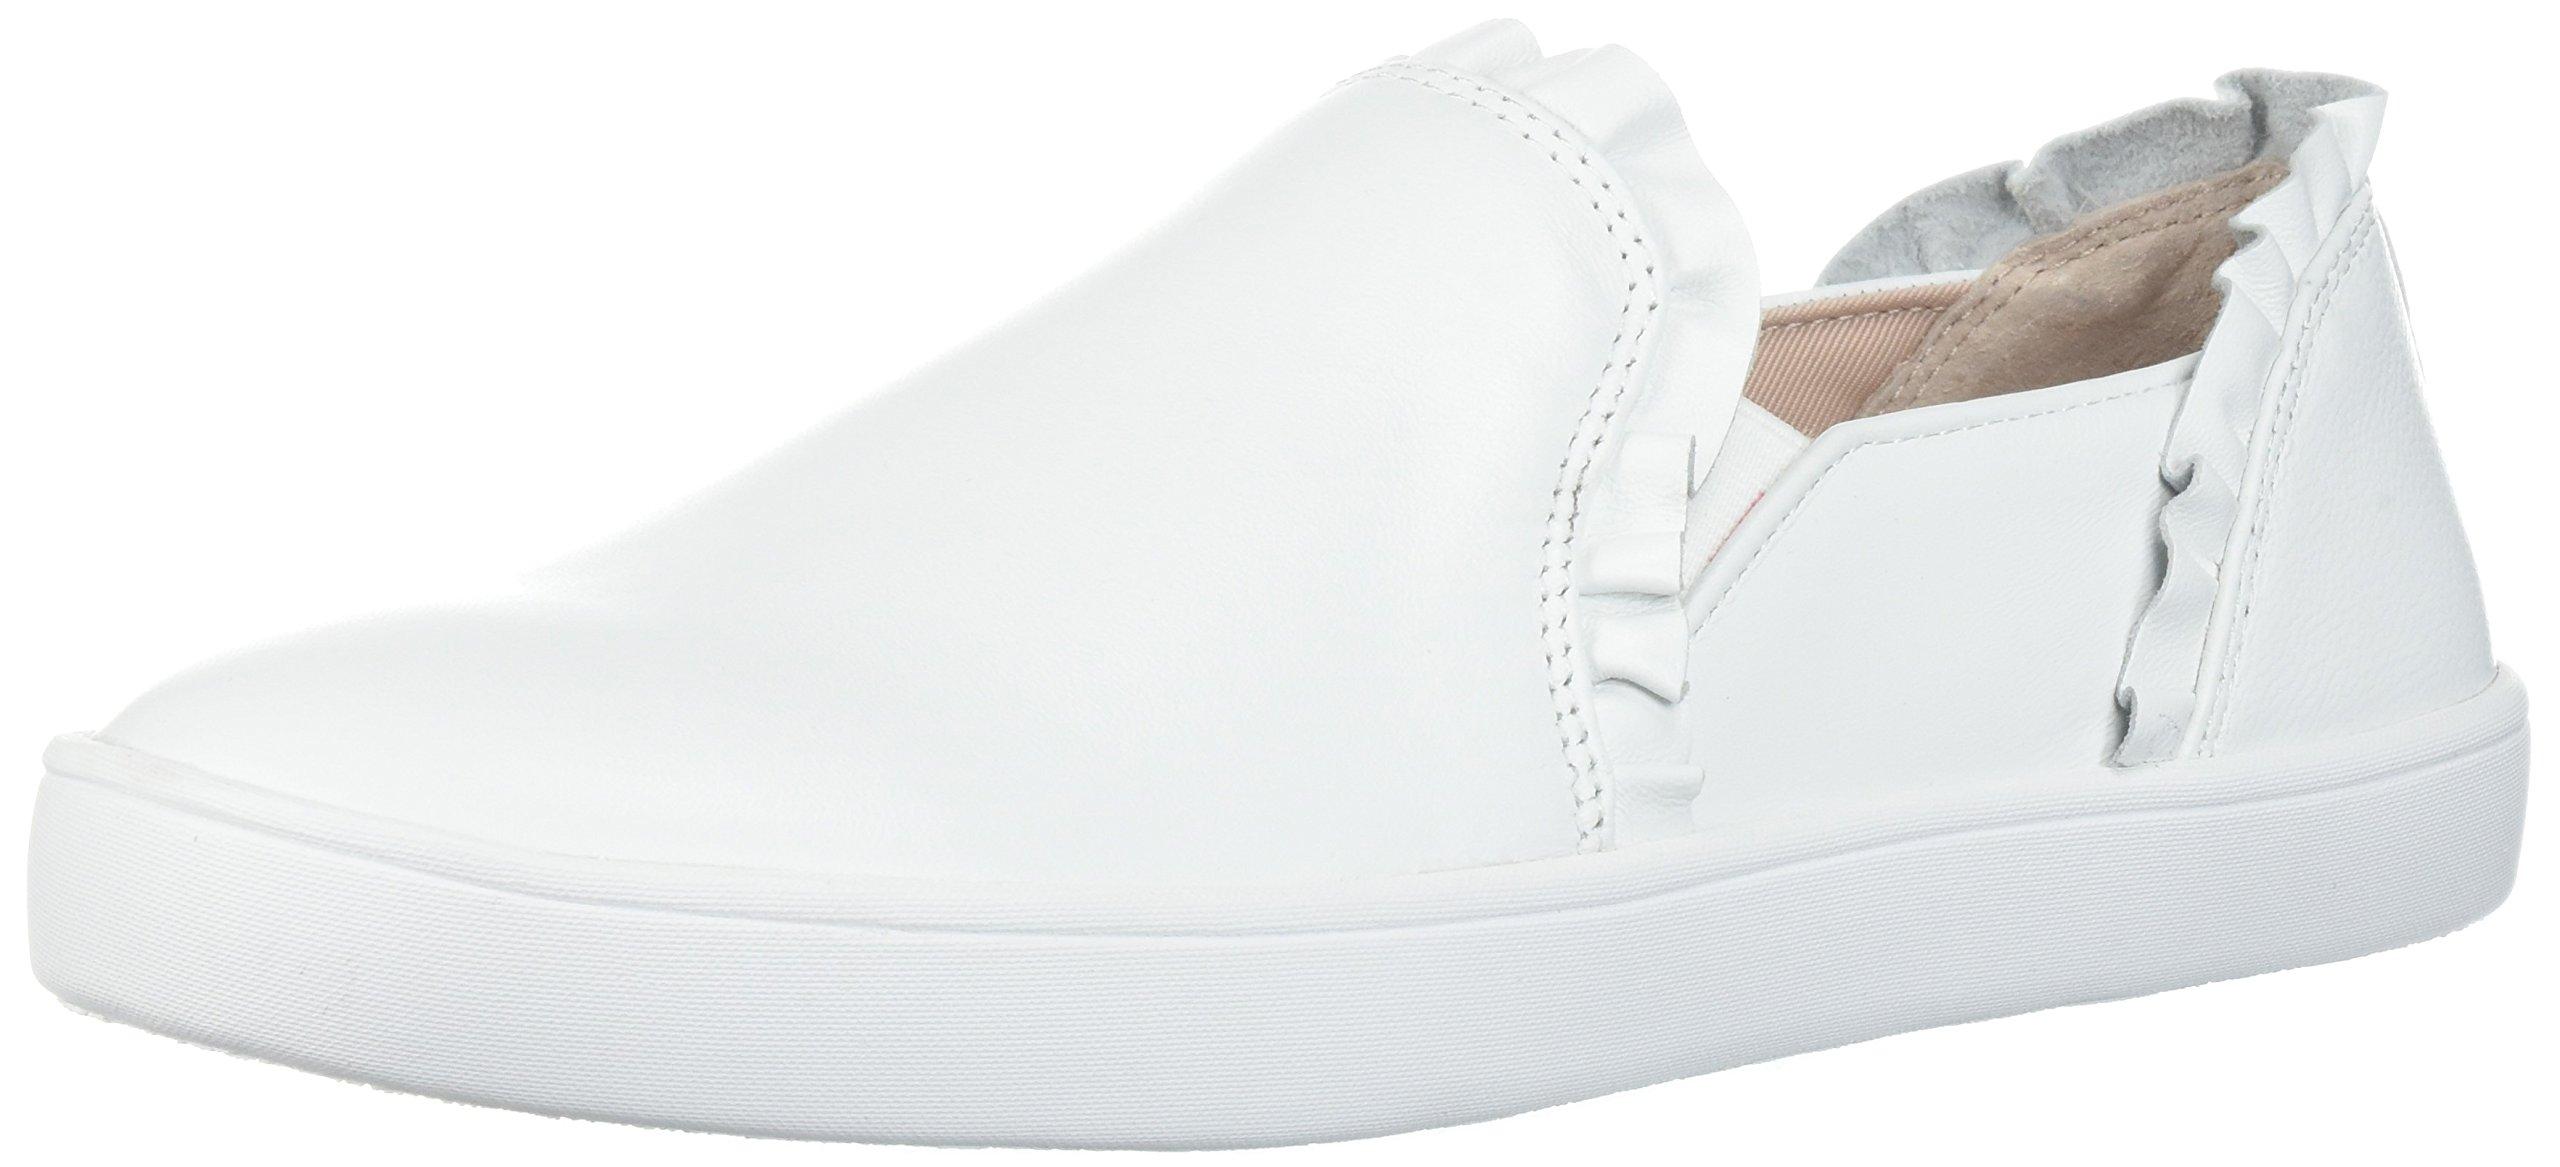 Kate Spade New York Women's Lilly Sneaker, White, 8 M US